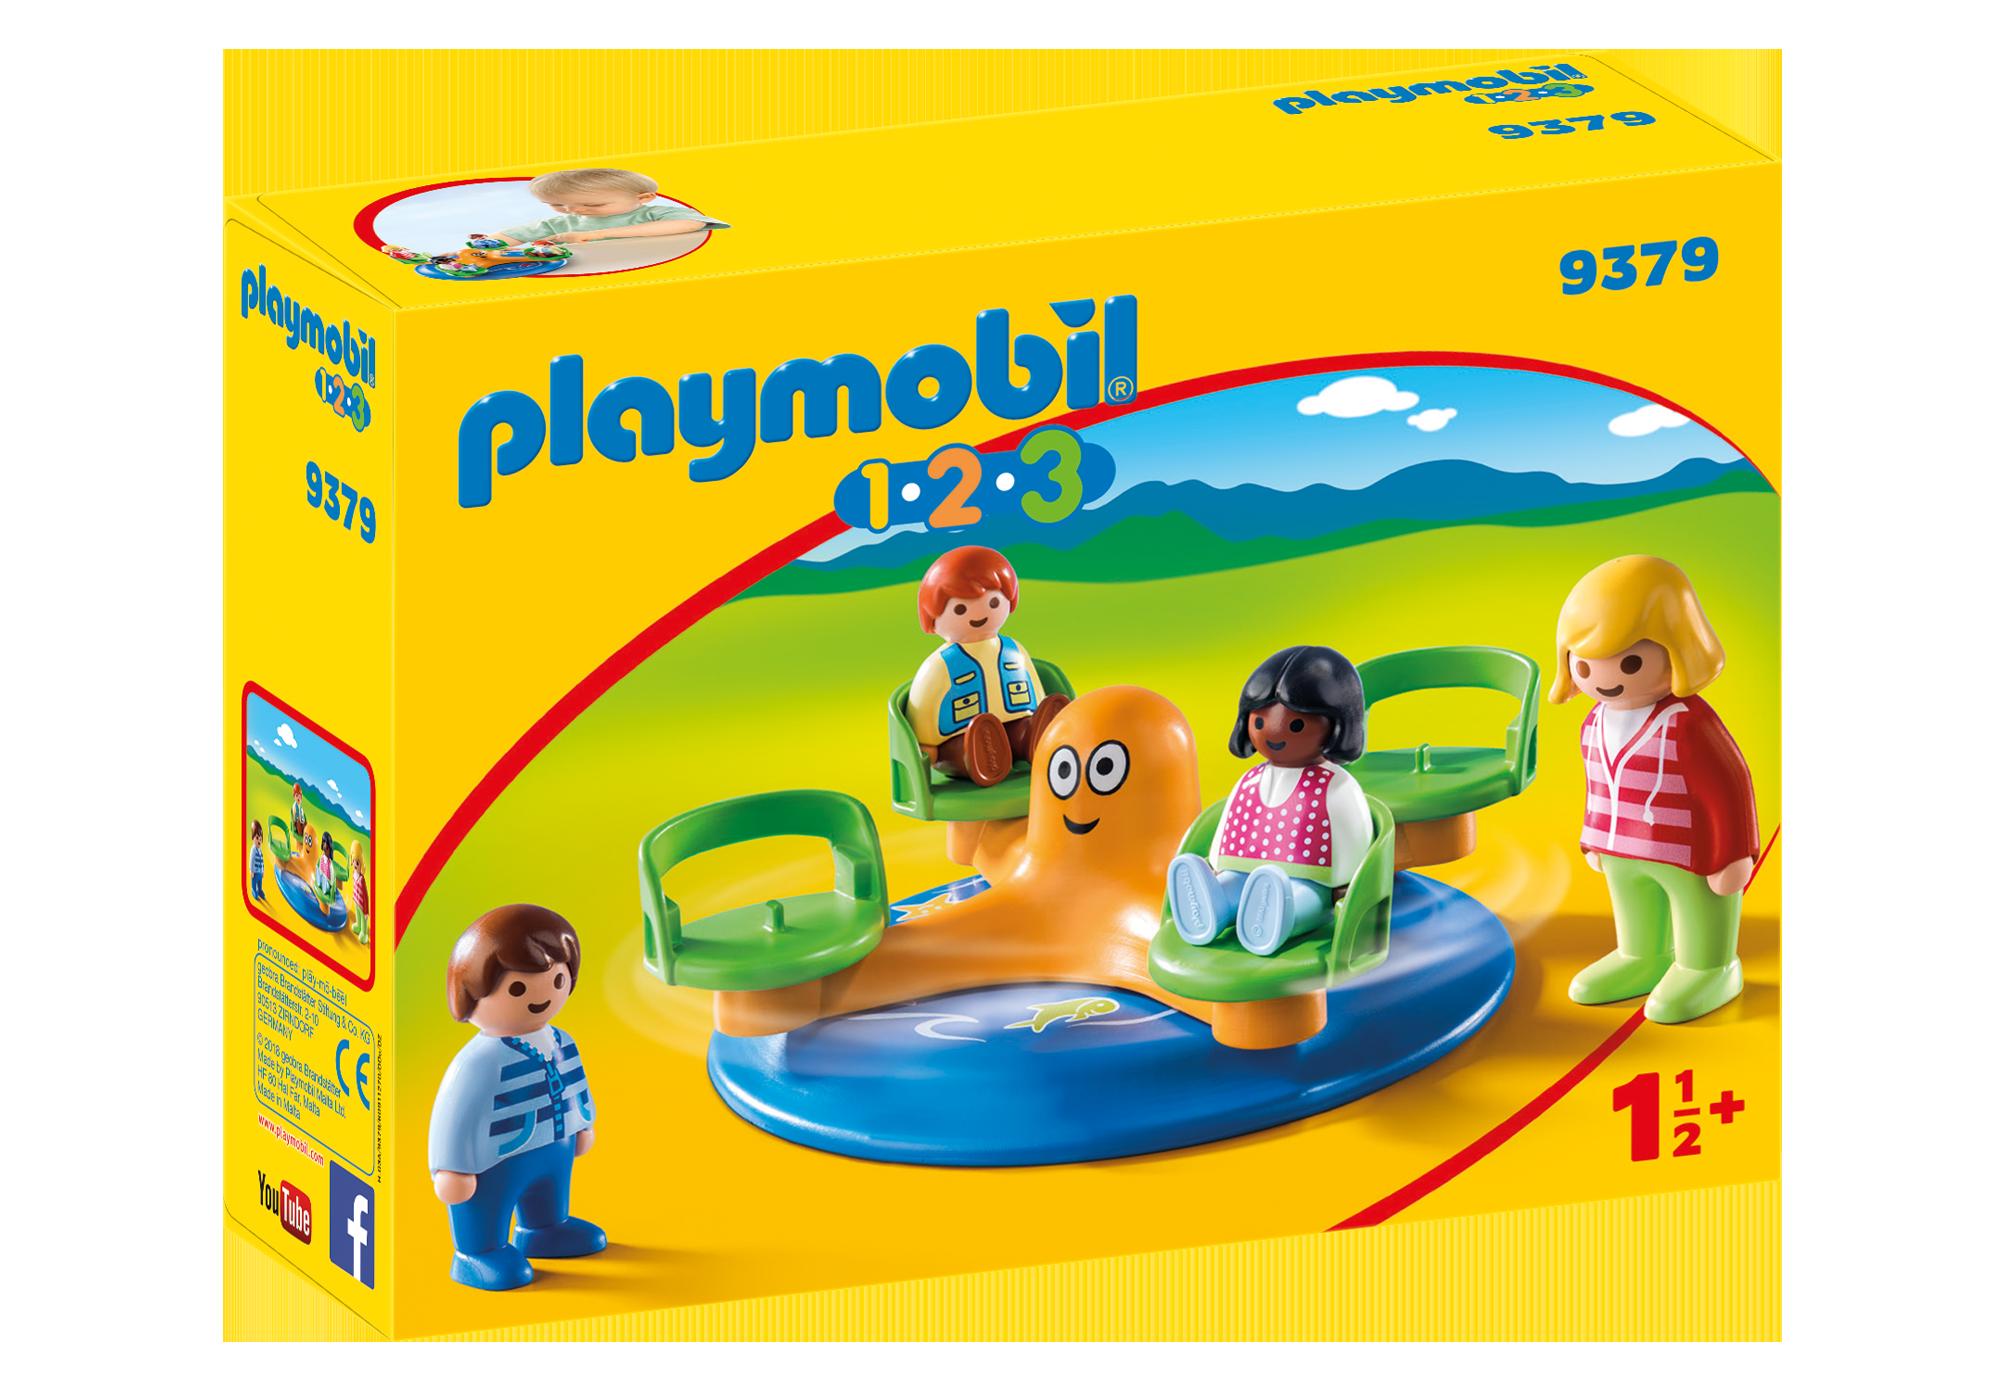 http://media.playmobil.com/i/playmobil/9379_product_box_front/Giostra dei bambini 1.2.3